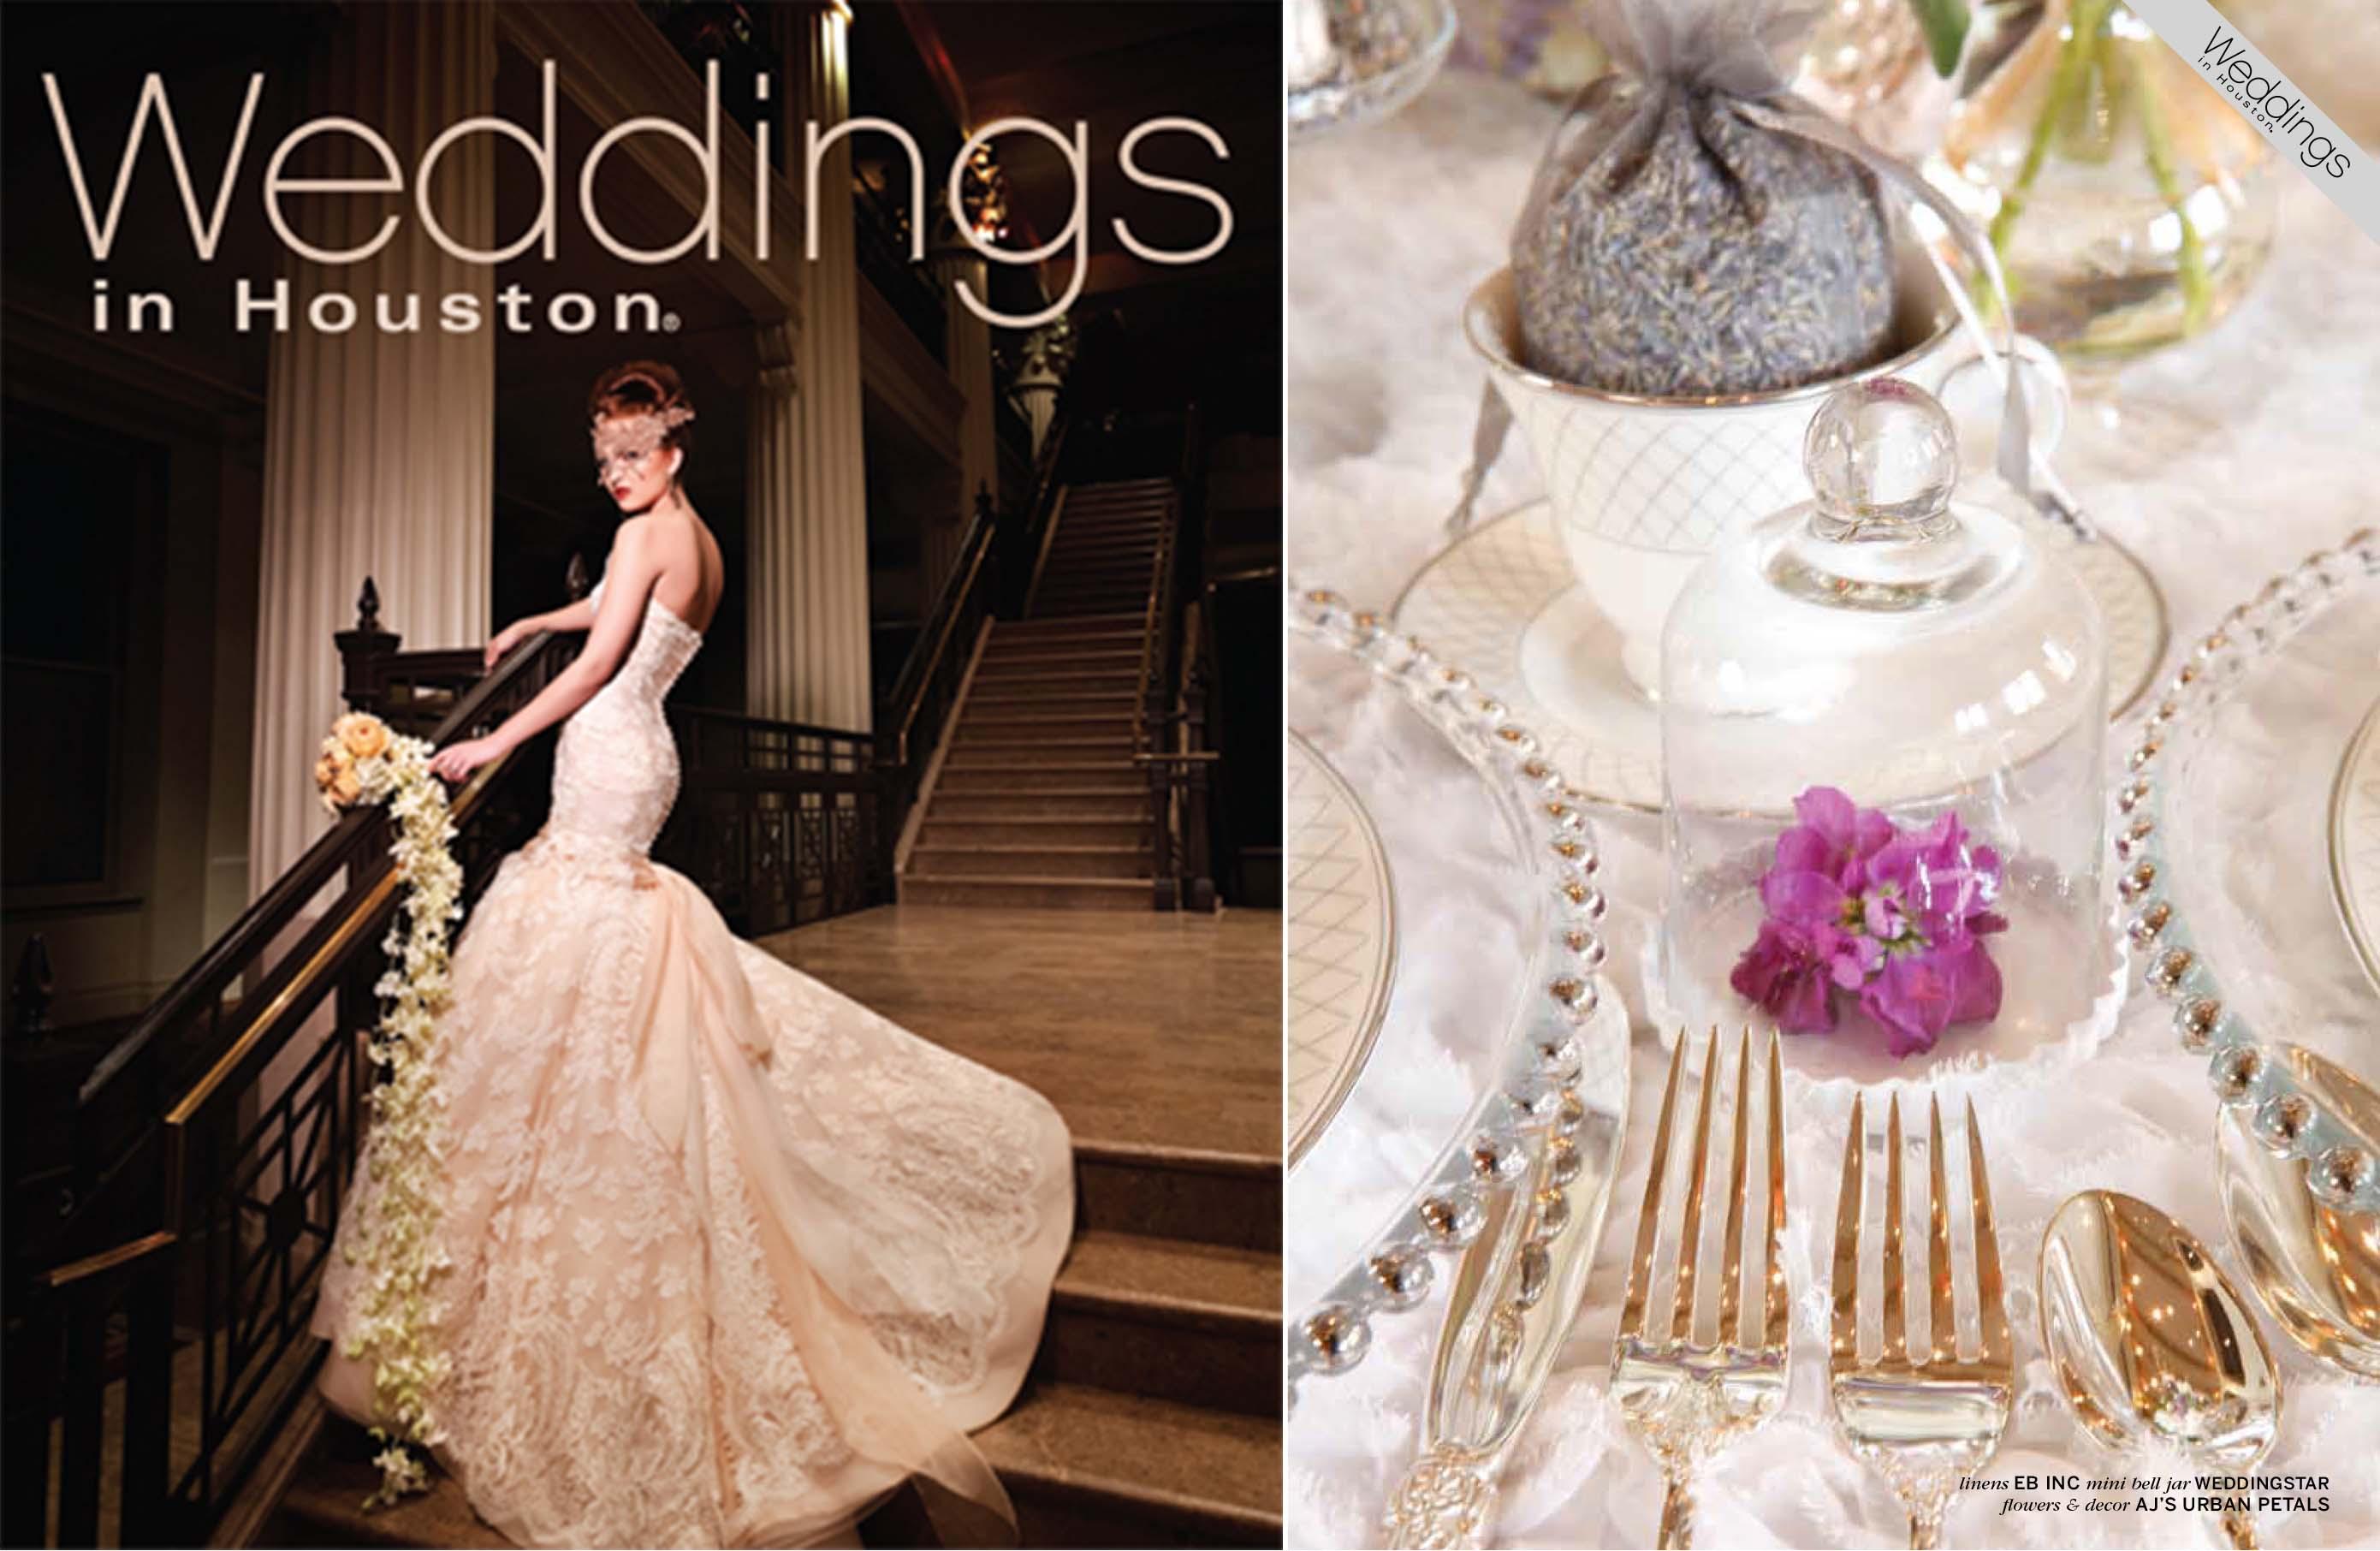 Weddings in Houston featured bell jars by Weddingstar. January 2014